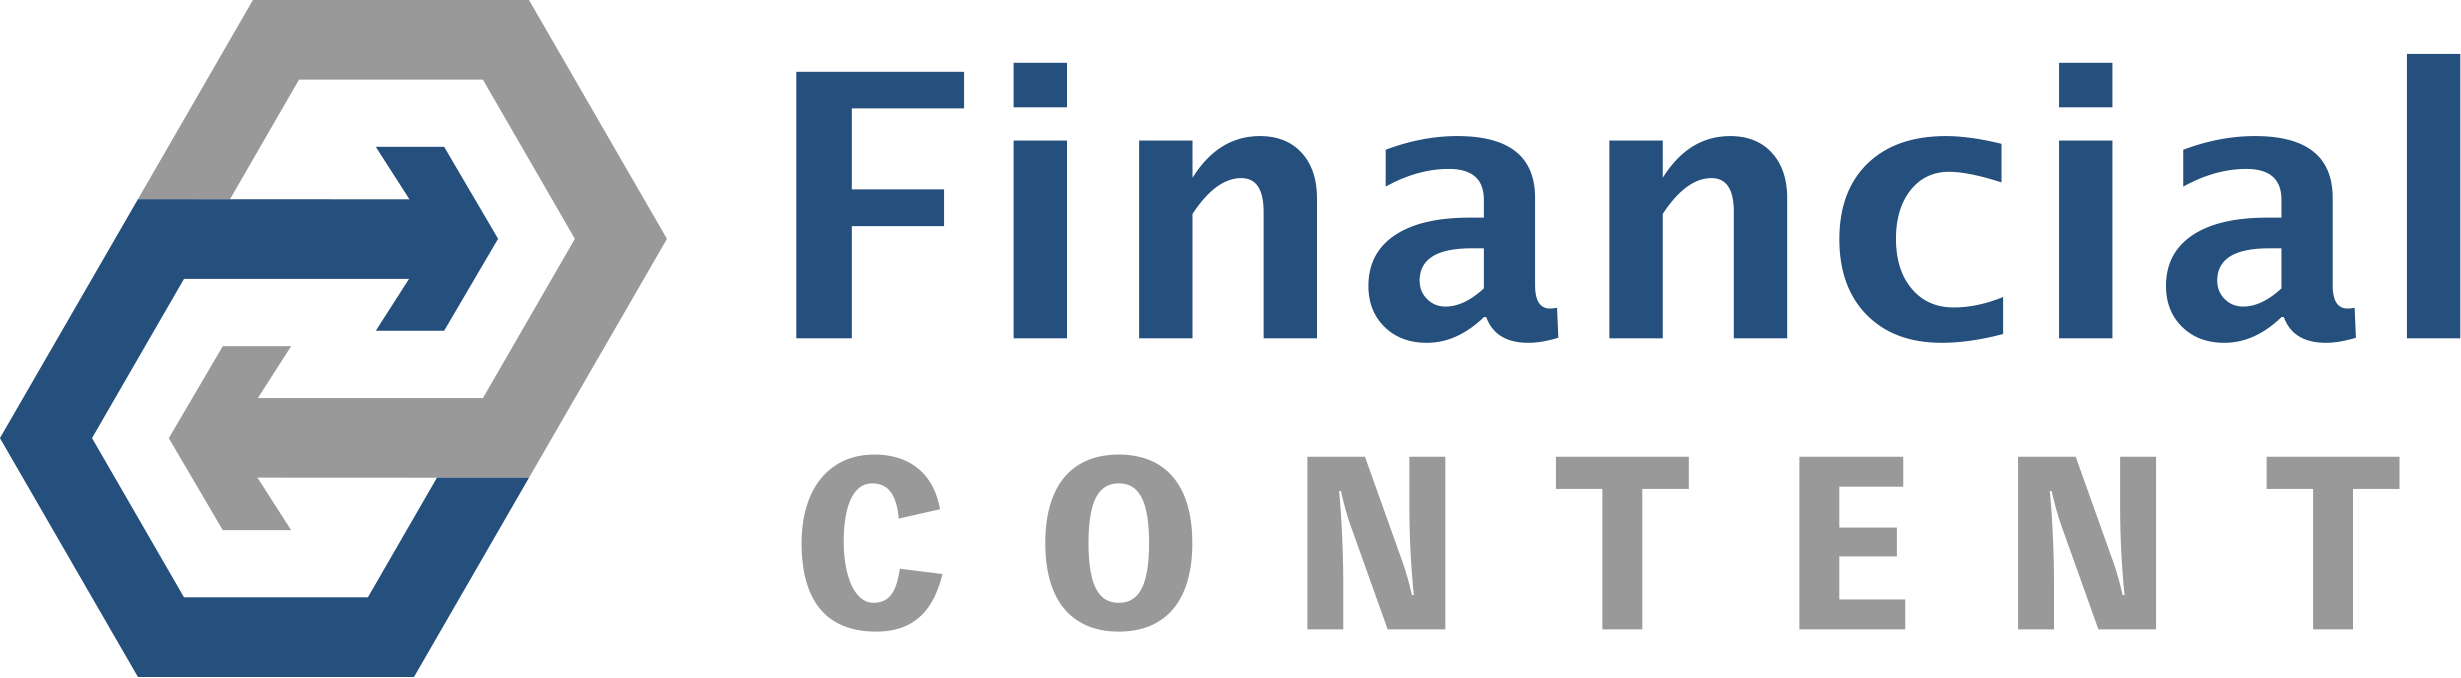 financial content logo